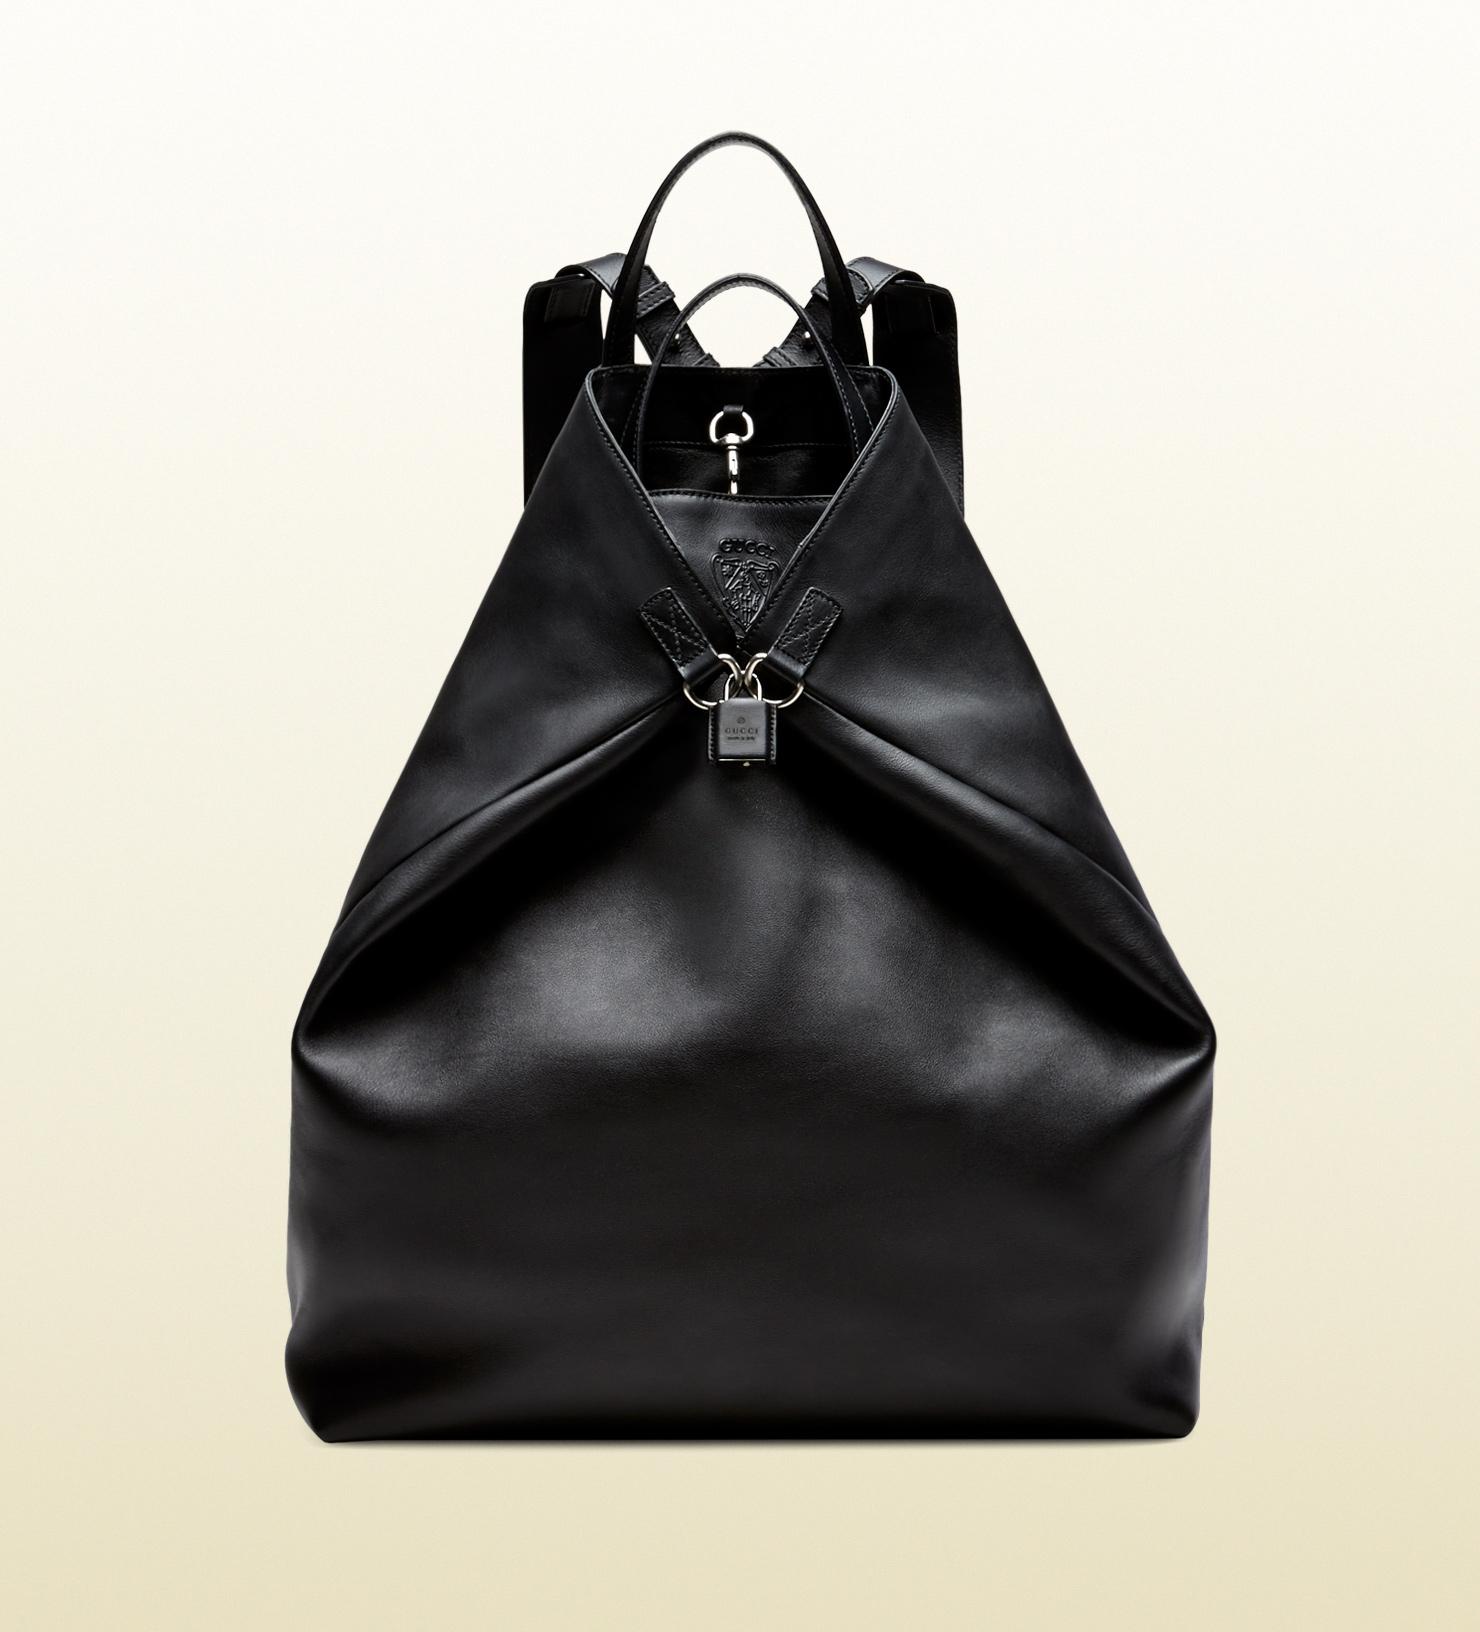 Gucci Gactive Large Black Leather Backpack in Black for Men | Lyst